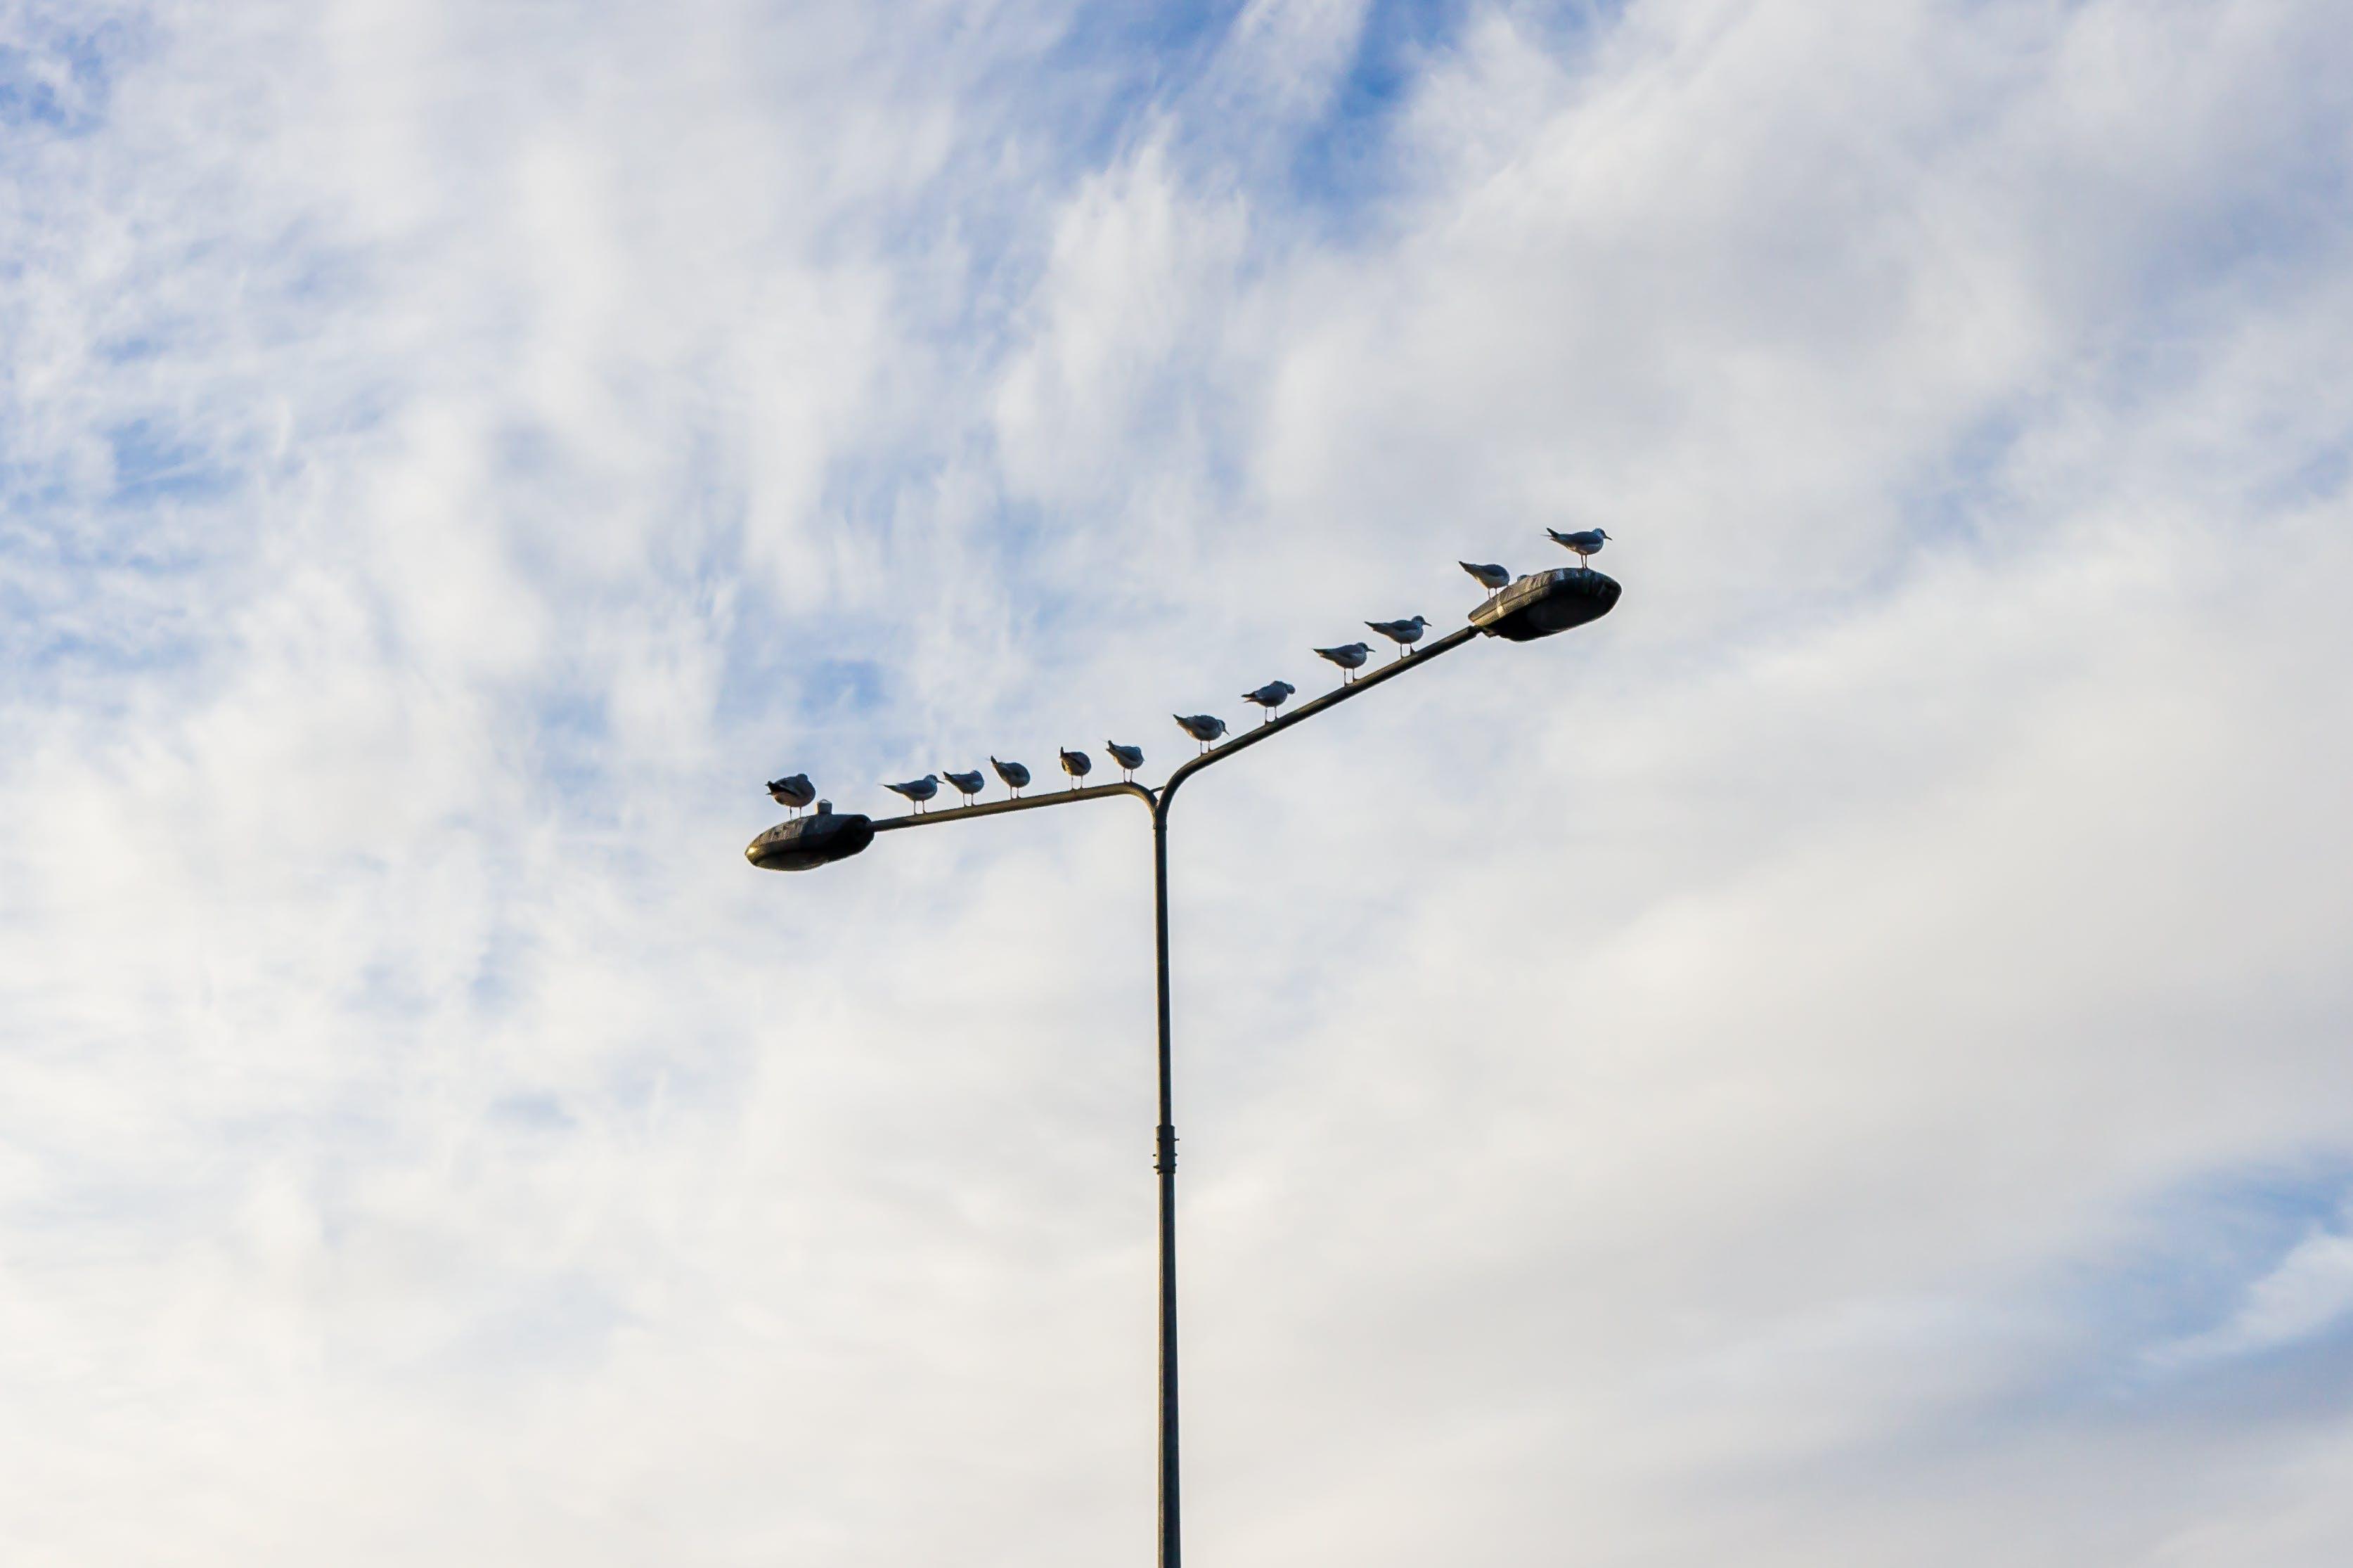 Free stock photo of #pole #sky #birds #clouds #mnimalist